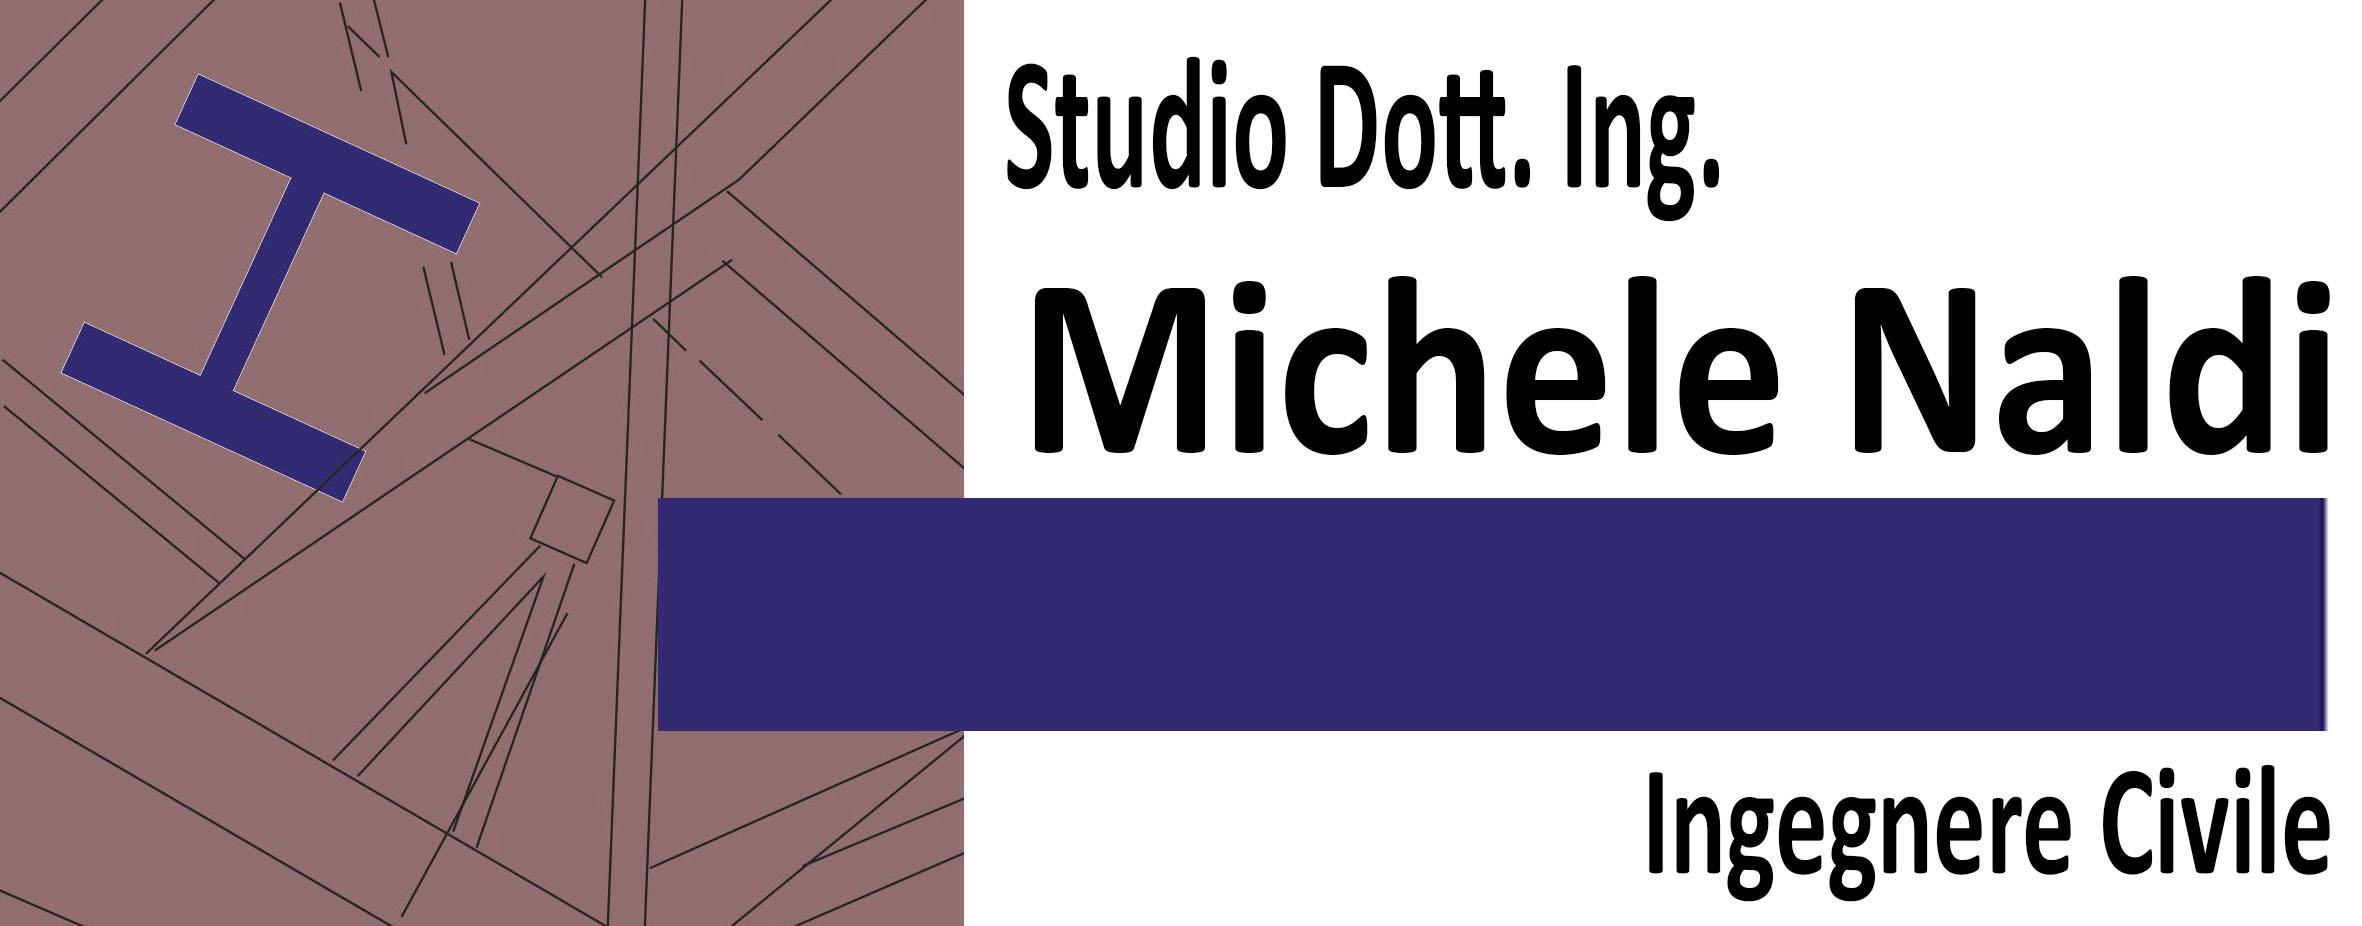 Studio Dott. Ing. Michele Naldi